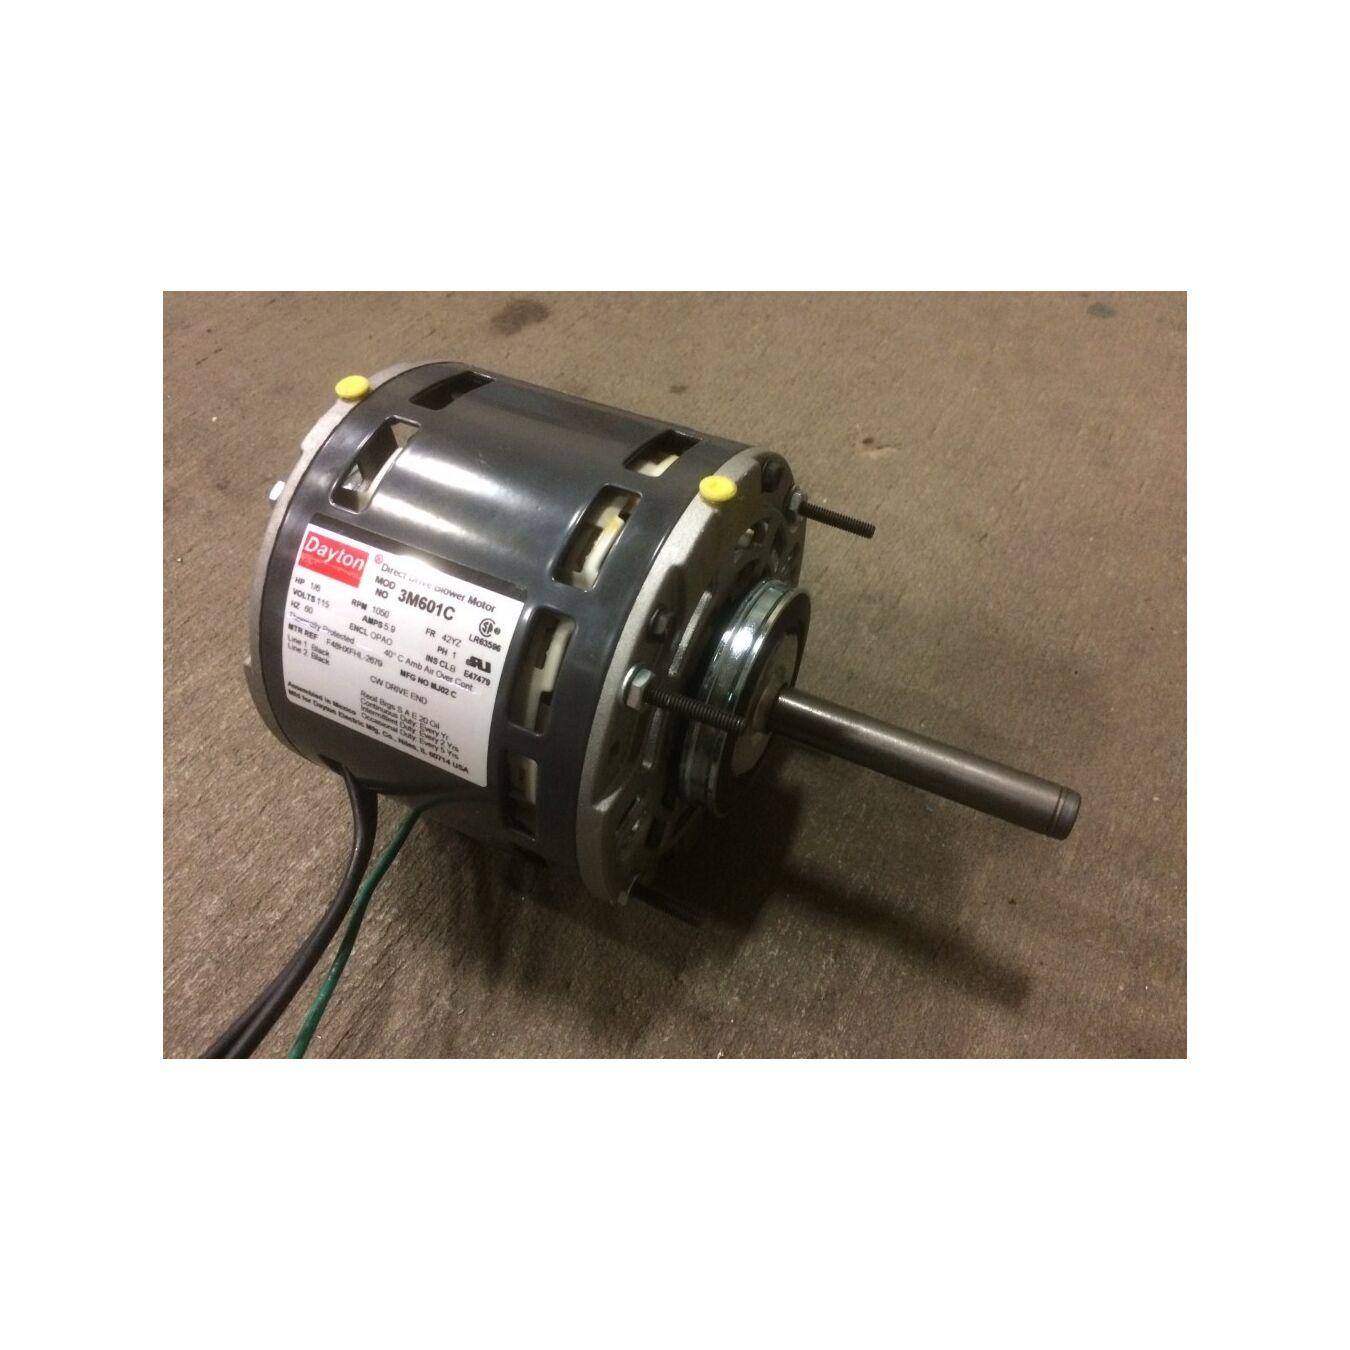 1 6 hp dayton 3m601c direct drive blower motor 42yz frame for Who makes dayton motors